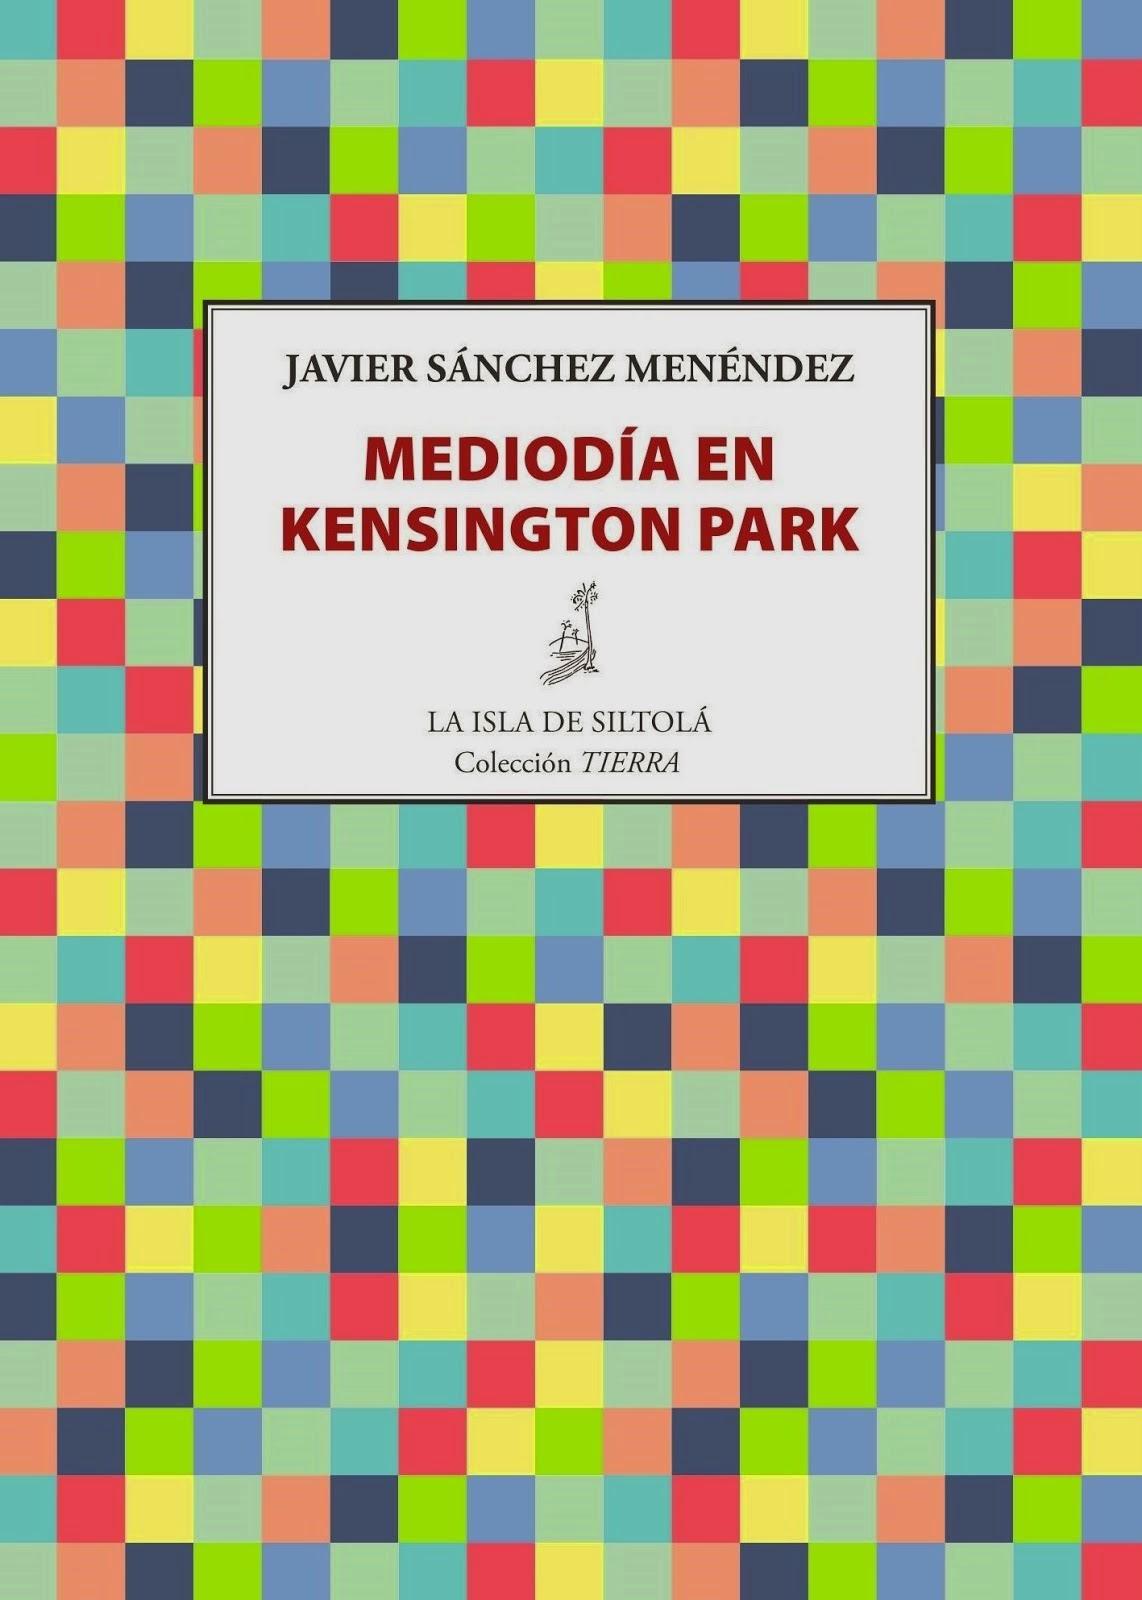 http://encuentrosconlasletras.blogspot.com.es/2015/02/mediodia-en-kensington-park.html